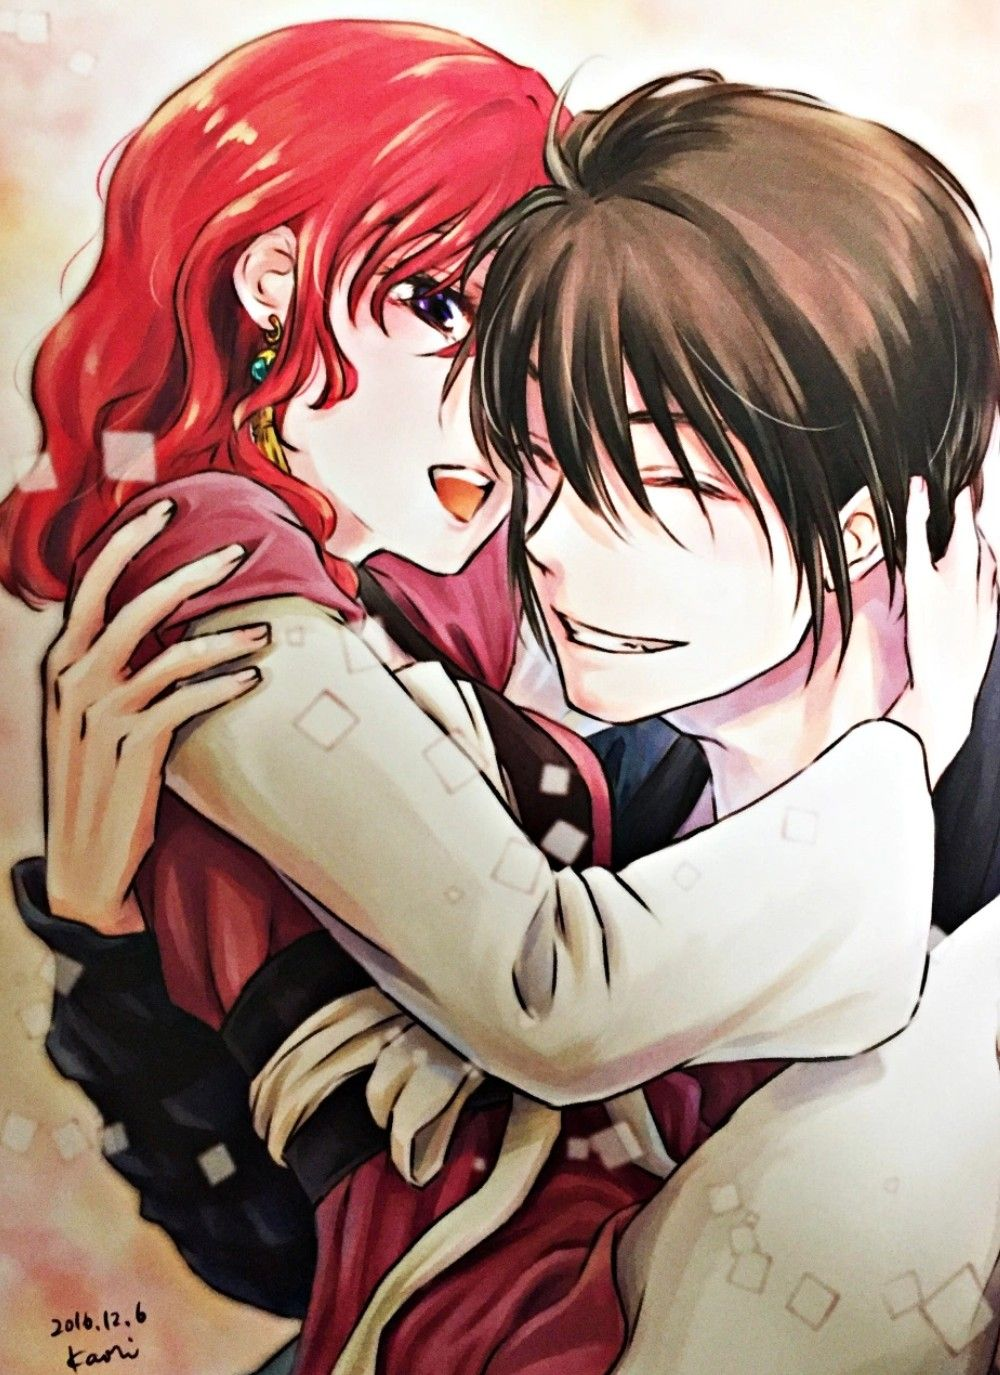 They Re So Perfect I Love Kaori S Arts Credits Drawing Pad By Kaori Anime Memes De Anime Manga